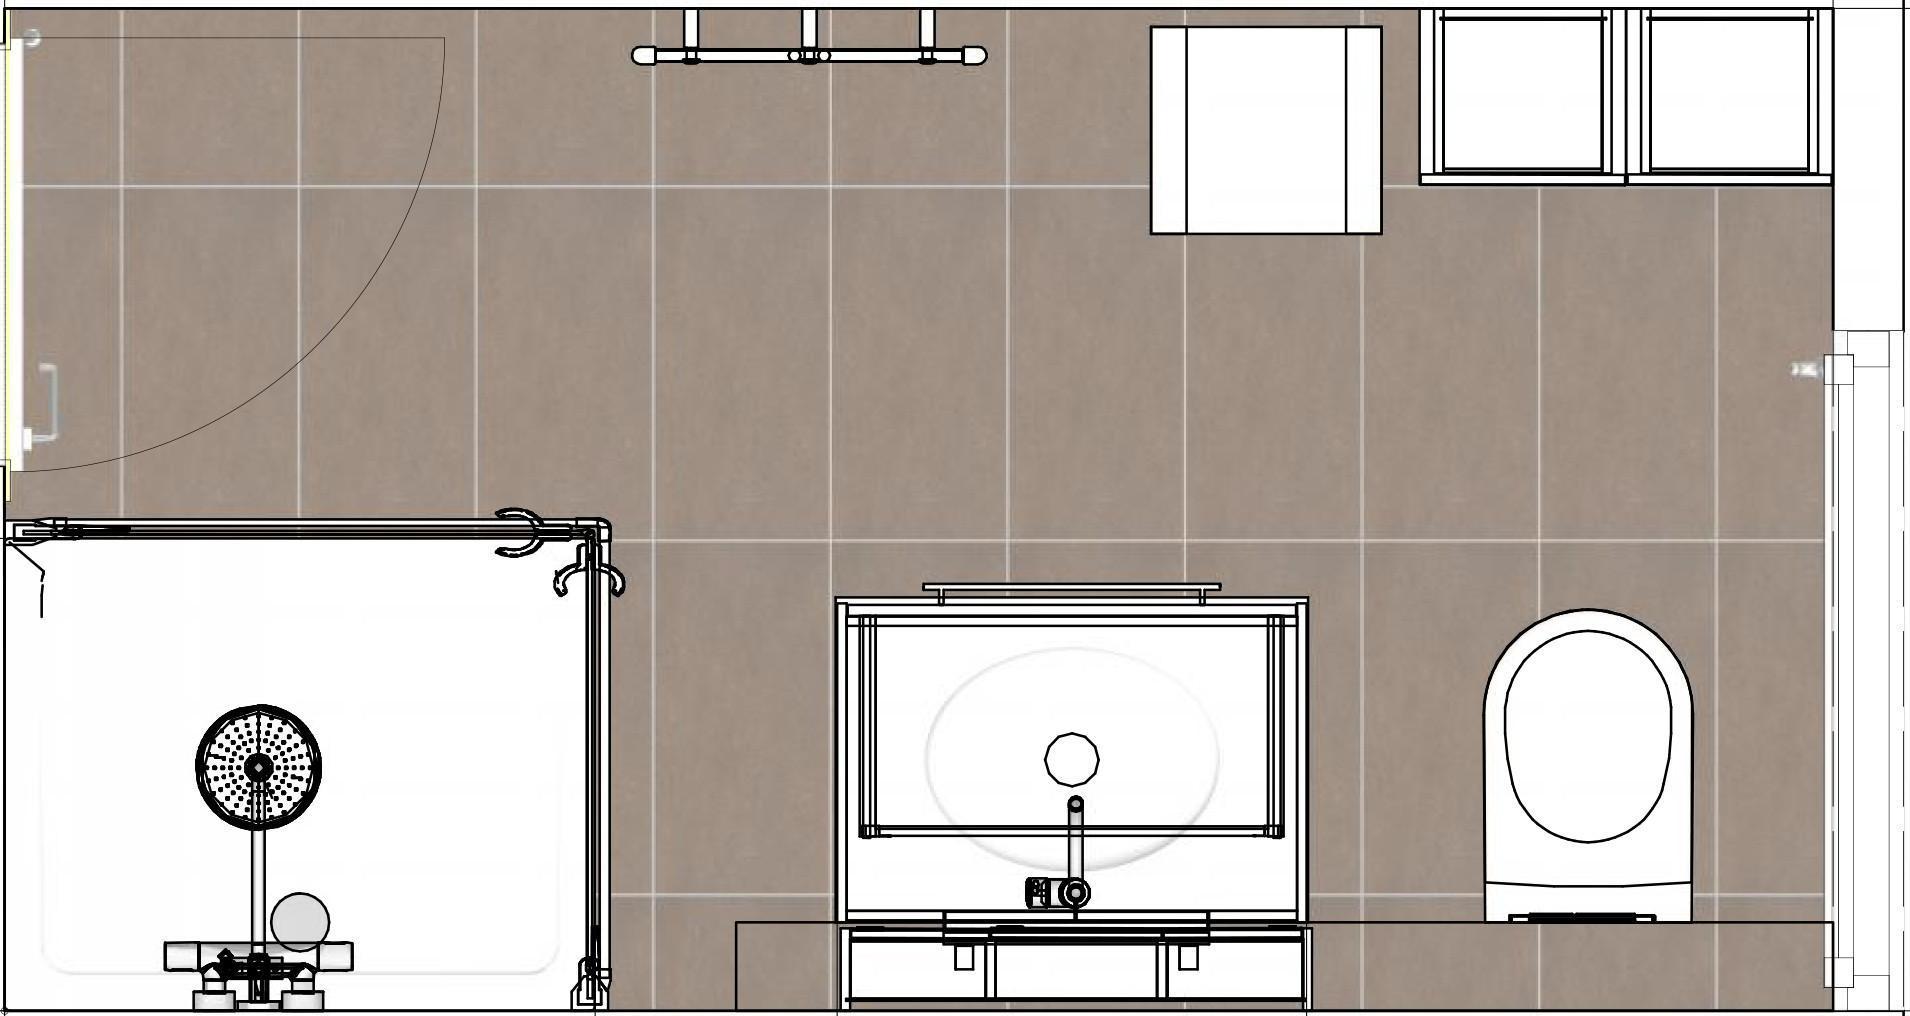 Grundriss Badezimmer 8 Qm